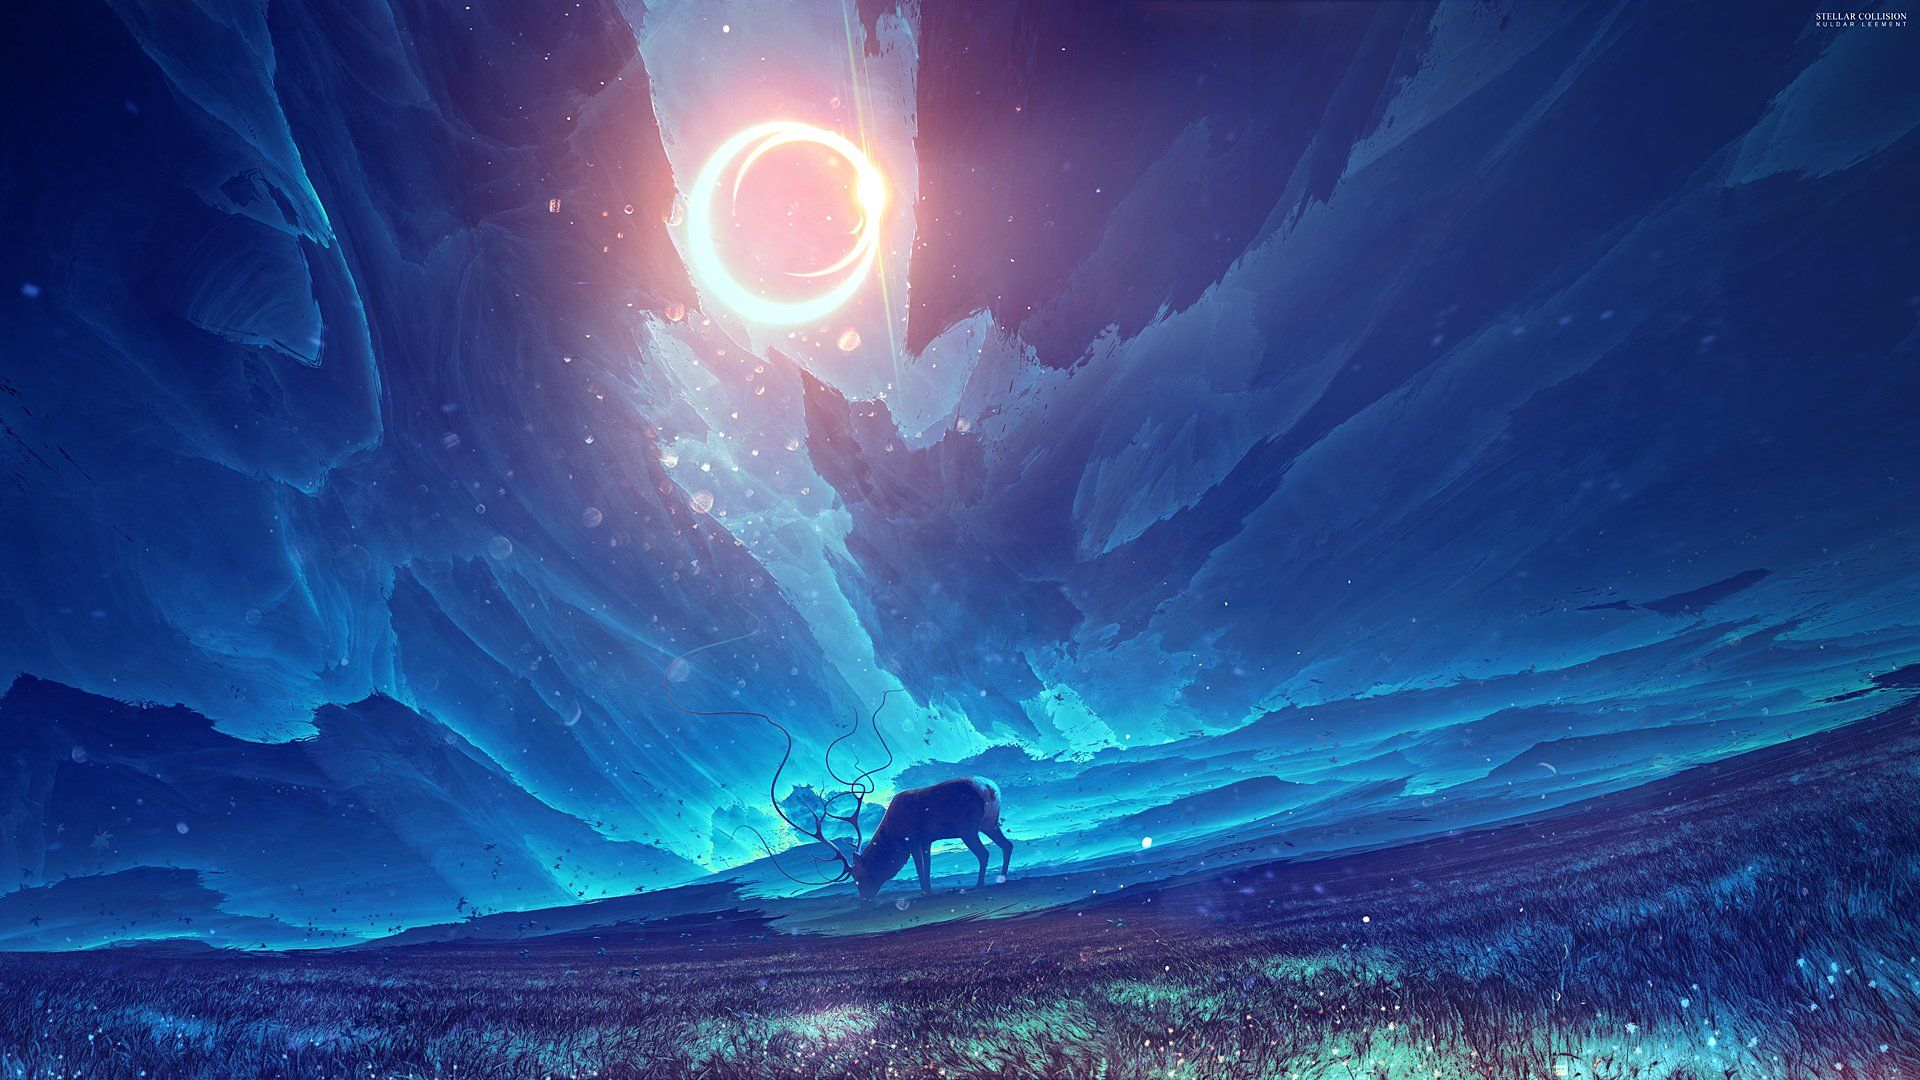 Horn Anime Sky Blue Moon Animal Wallpaper 1920x1080 602873 Wallpaperup Latar Belakang Ilustrasi Poster Fantasi